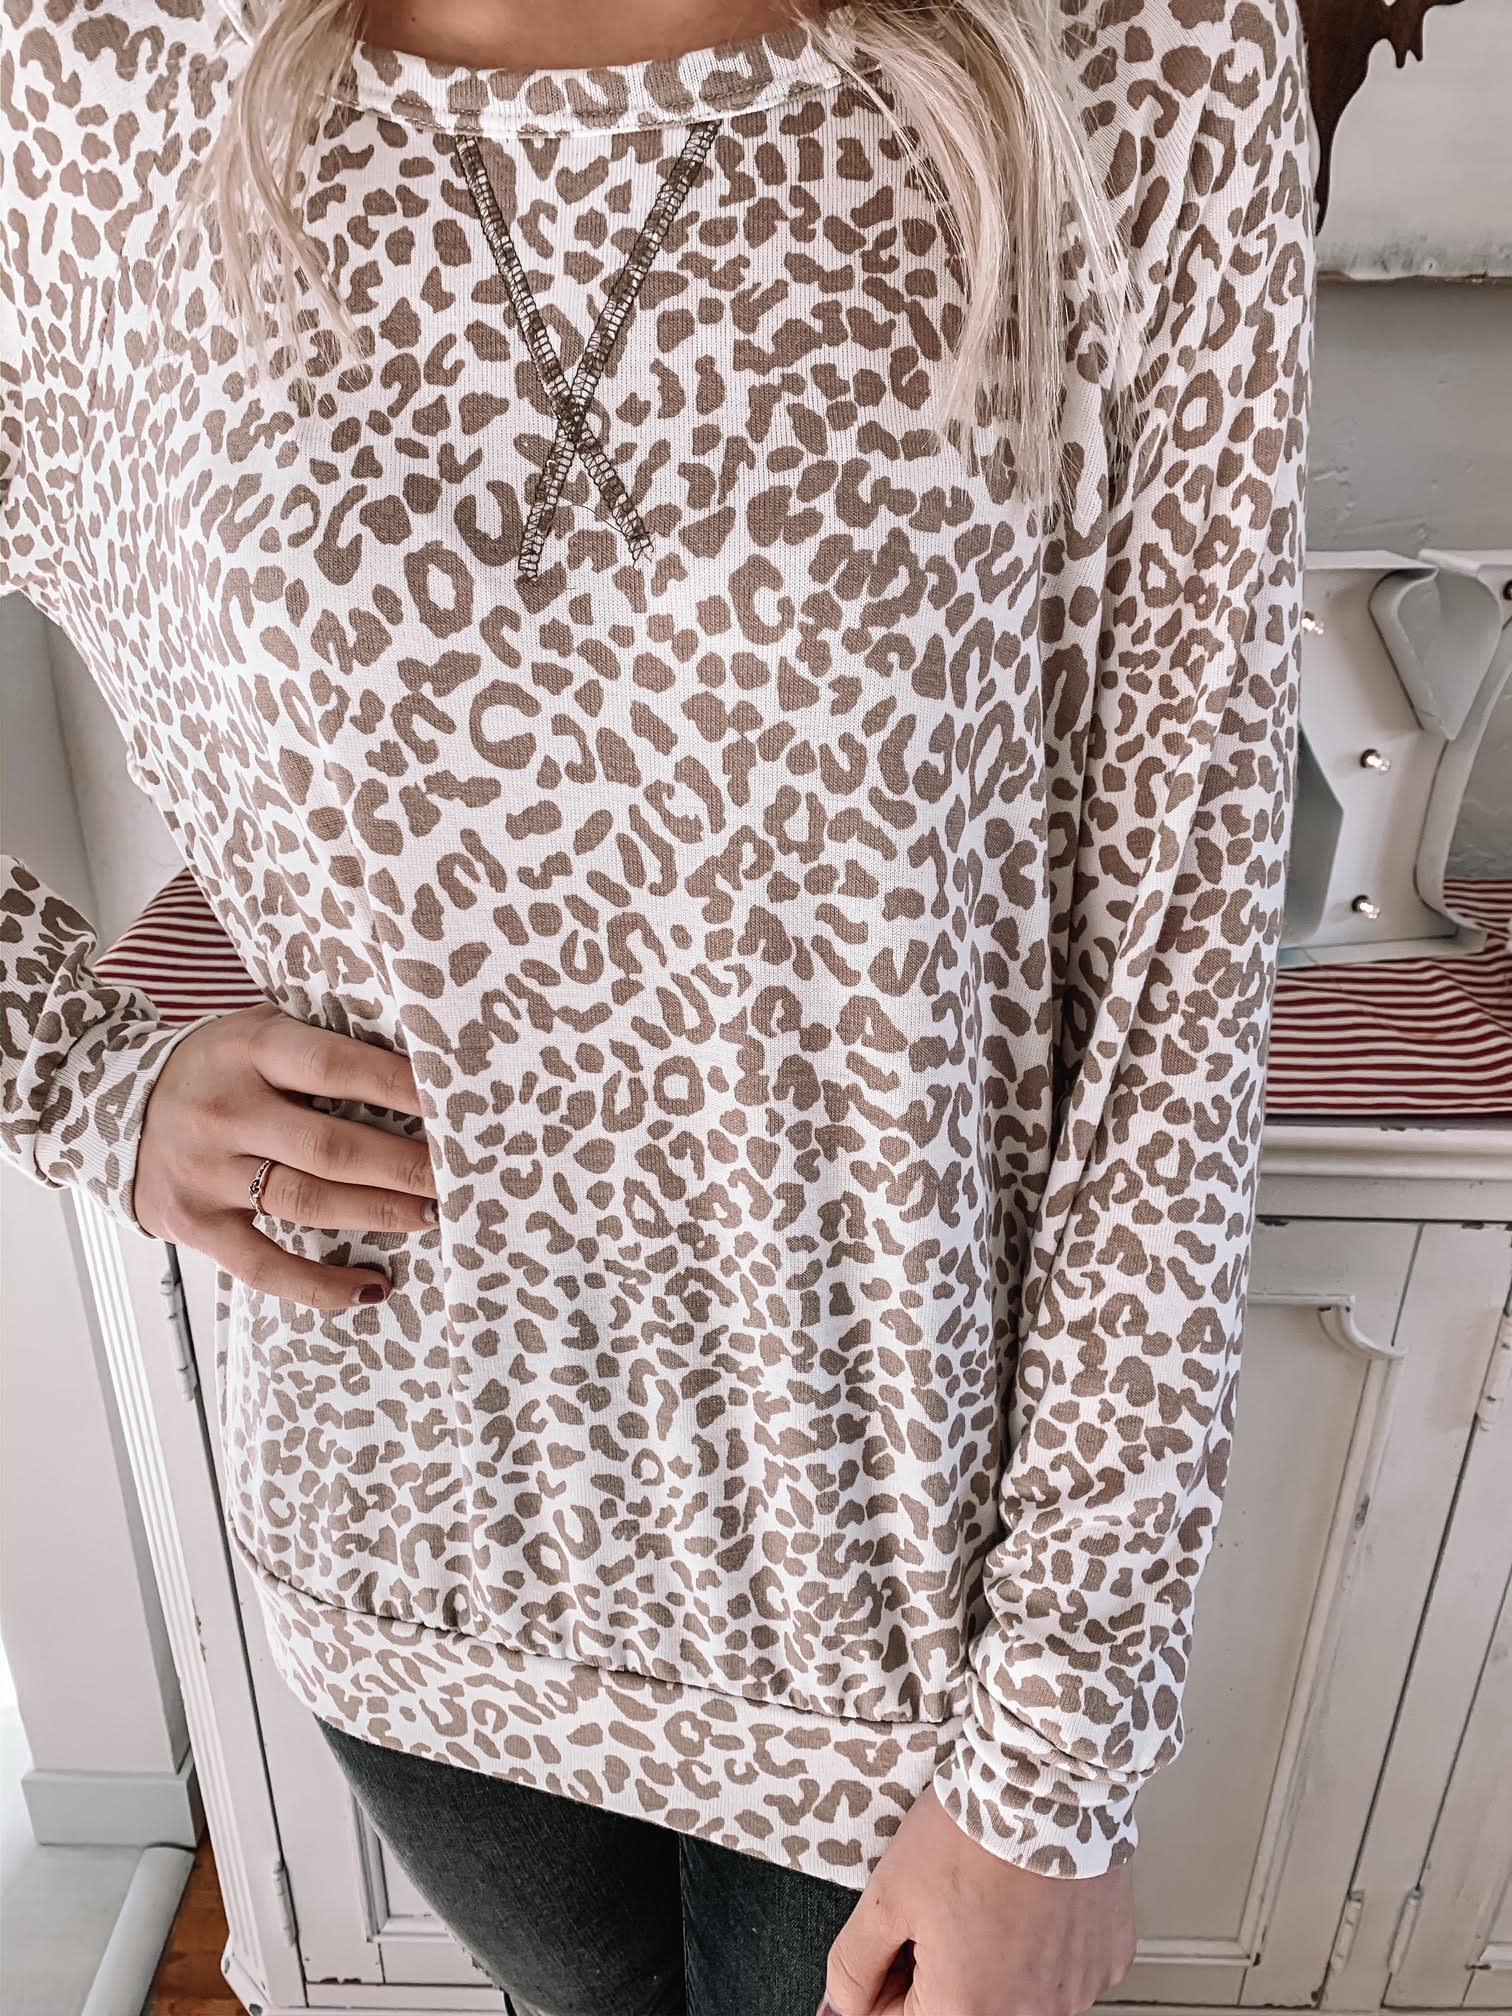 Lyla Taupe Leopard Top